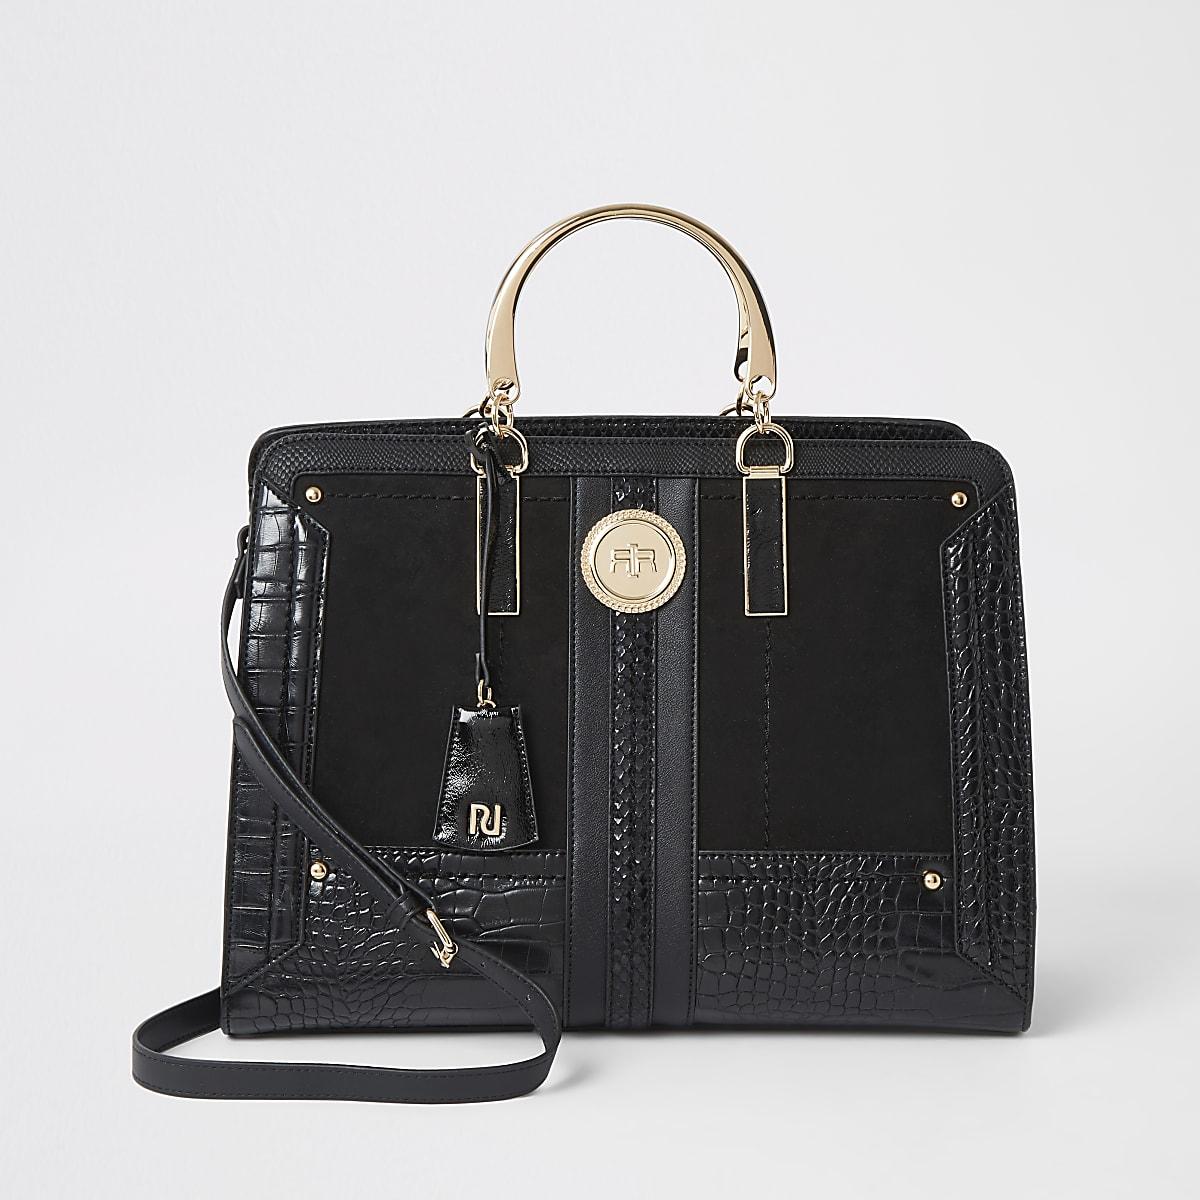 Black croc embossed tote bag